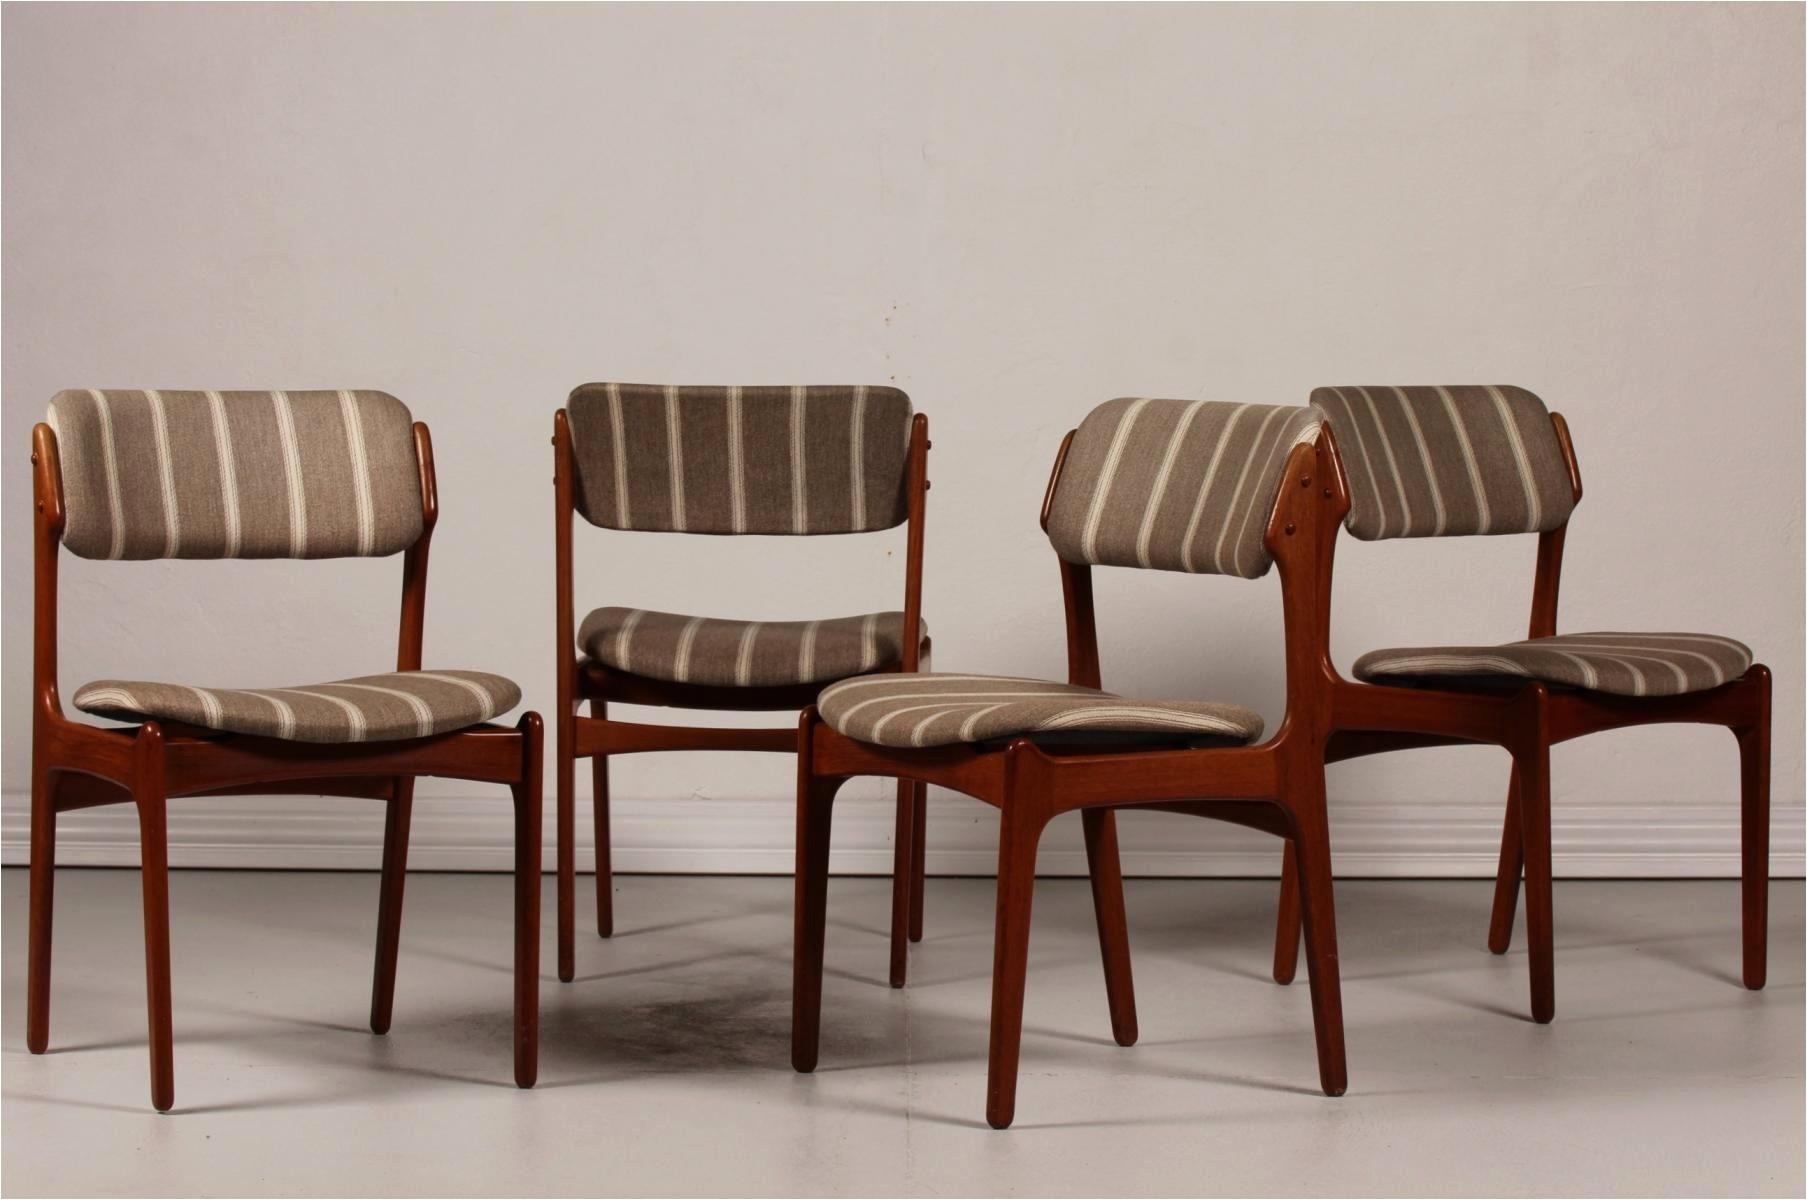 outdoor patio furniture atlanta ga inspirational chaise lounge chairs outdoor luxury luxuria¶s wicker outdoor sofa 0d